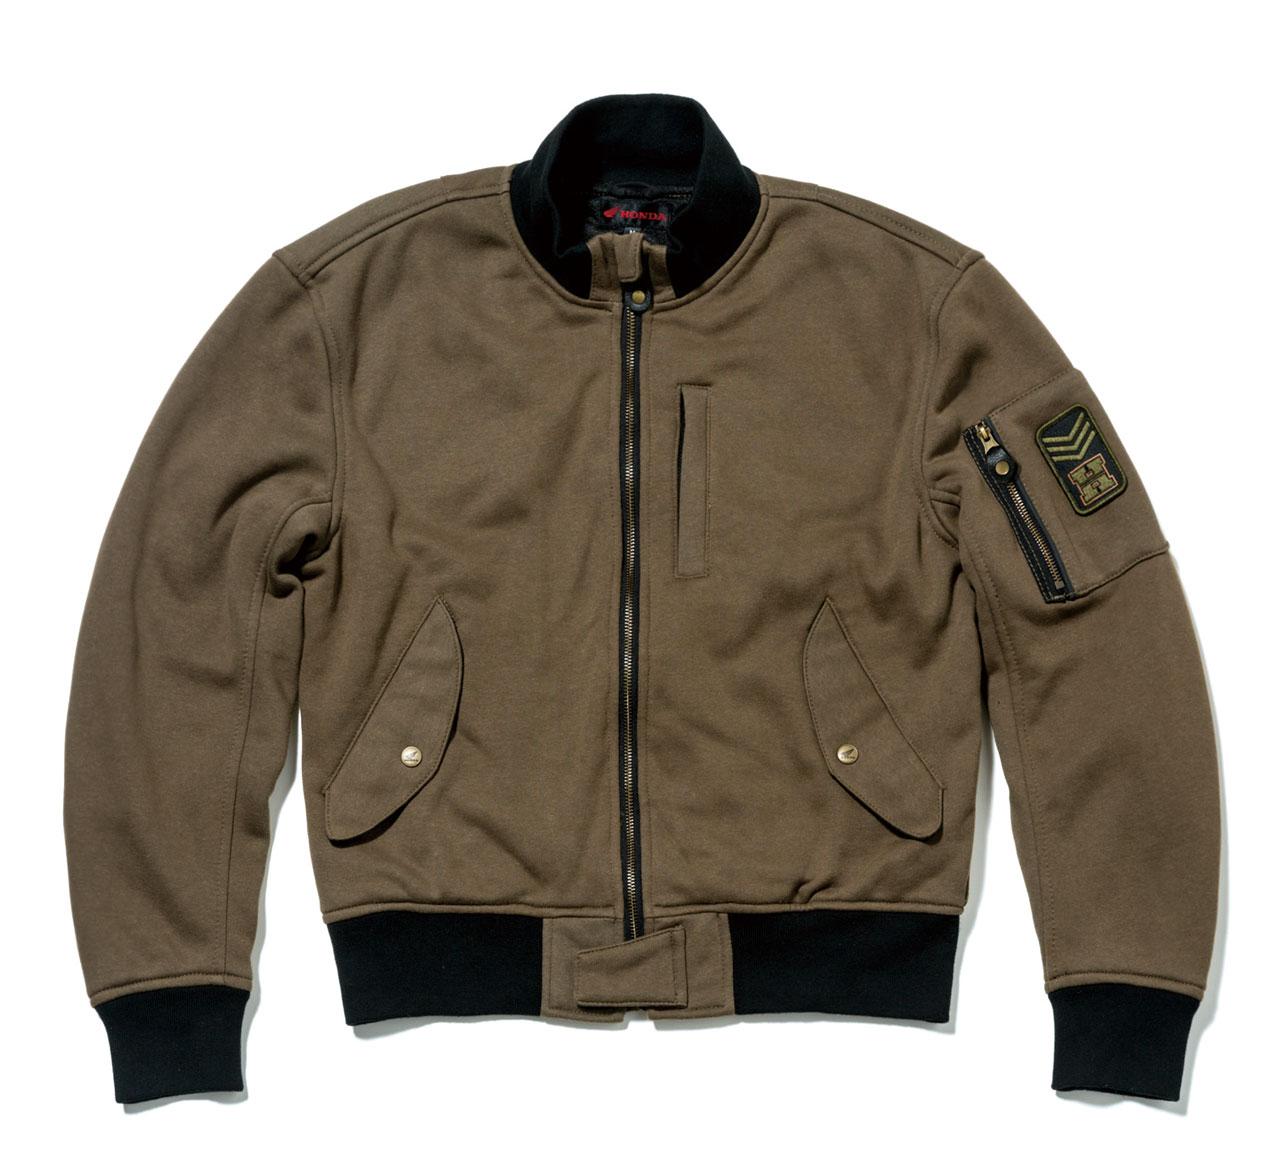 【HONDA RIDING GEAR】MA-1型防風布勞森外套 - 「Webike-摩托百貨」